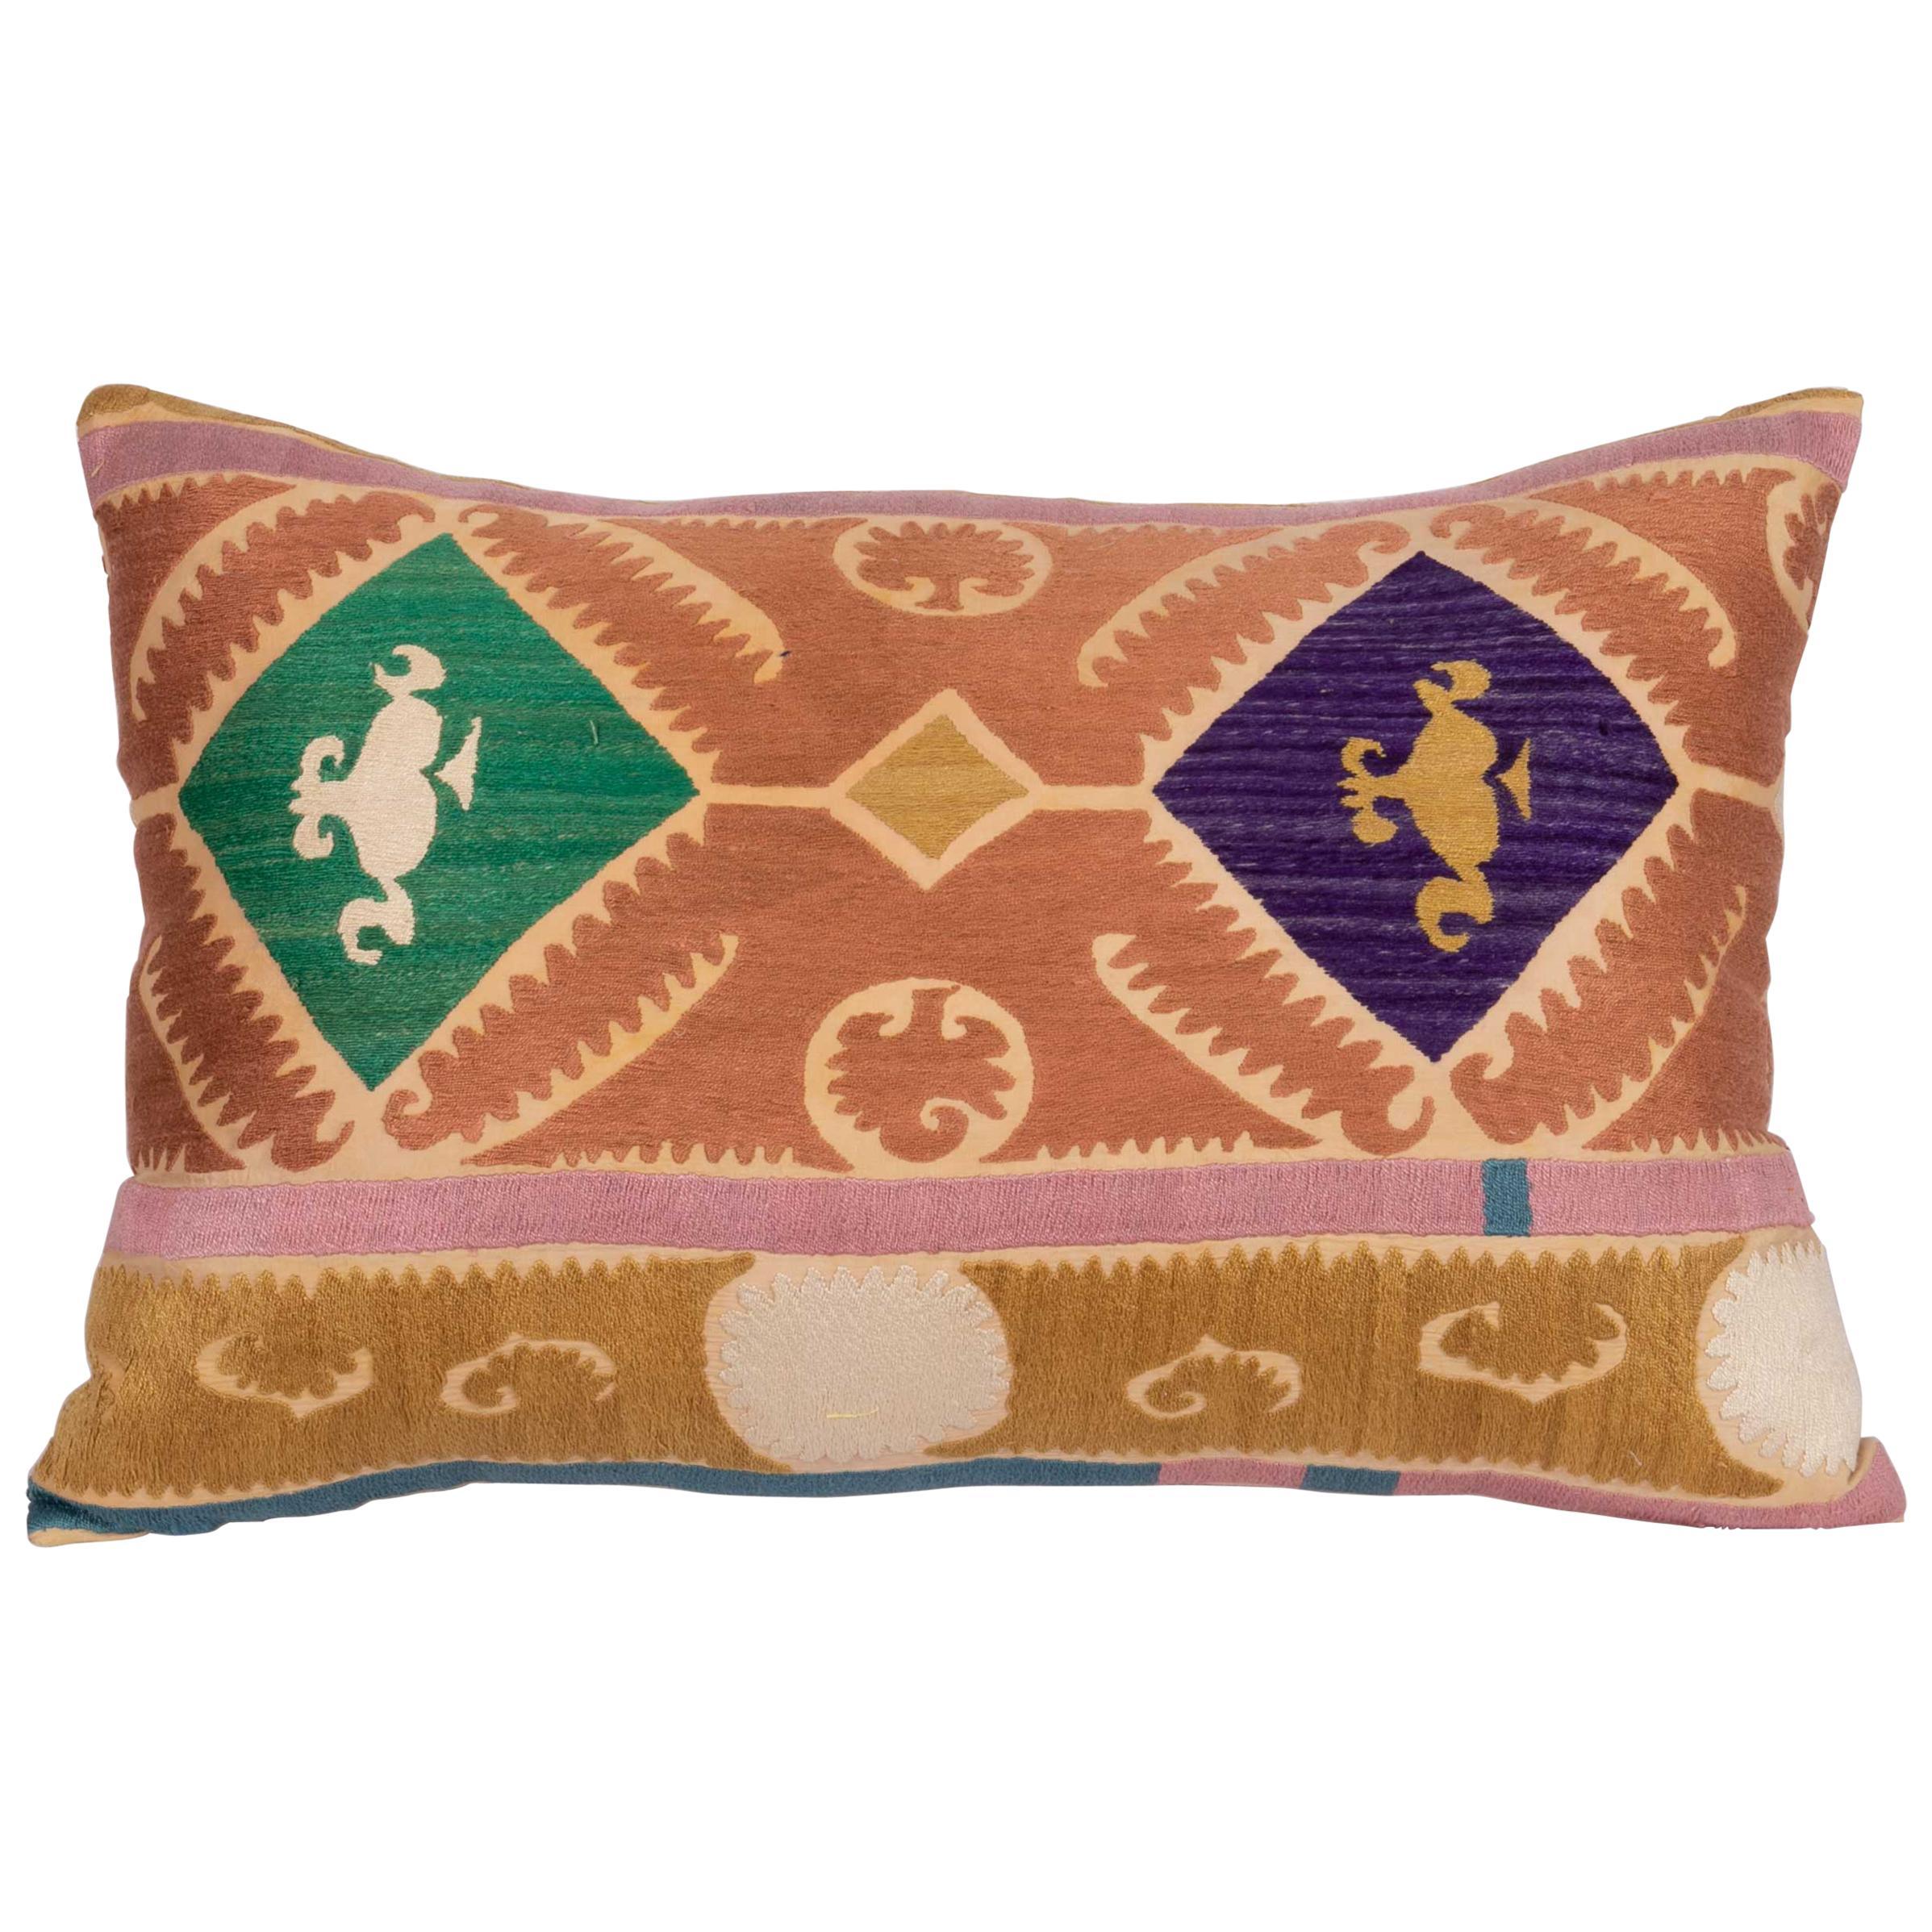 Suzani Pillow Case Made from a Vintage Uzbek Suzani, Mid-20th Century